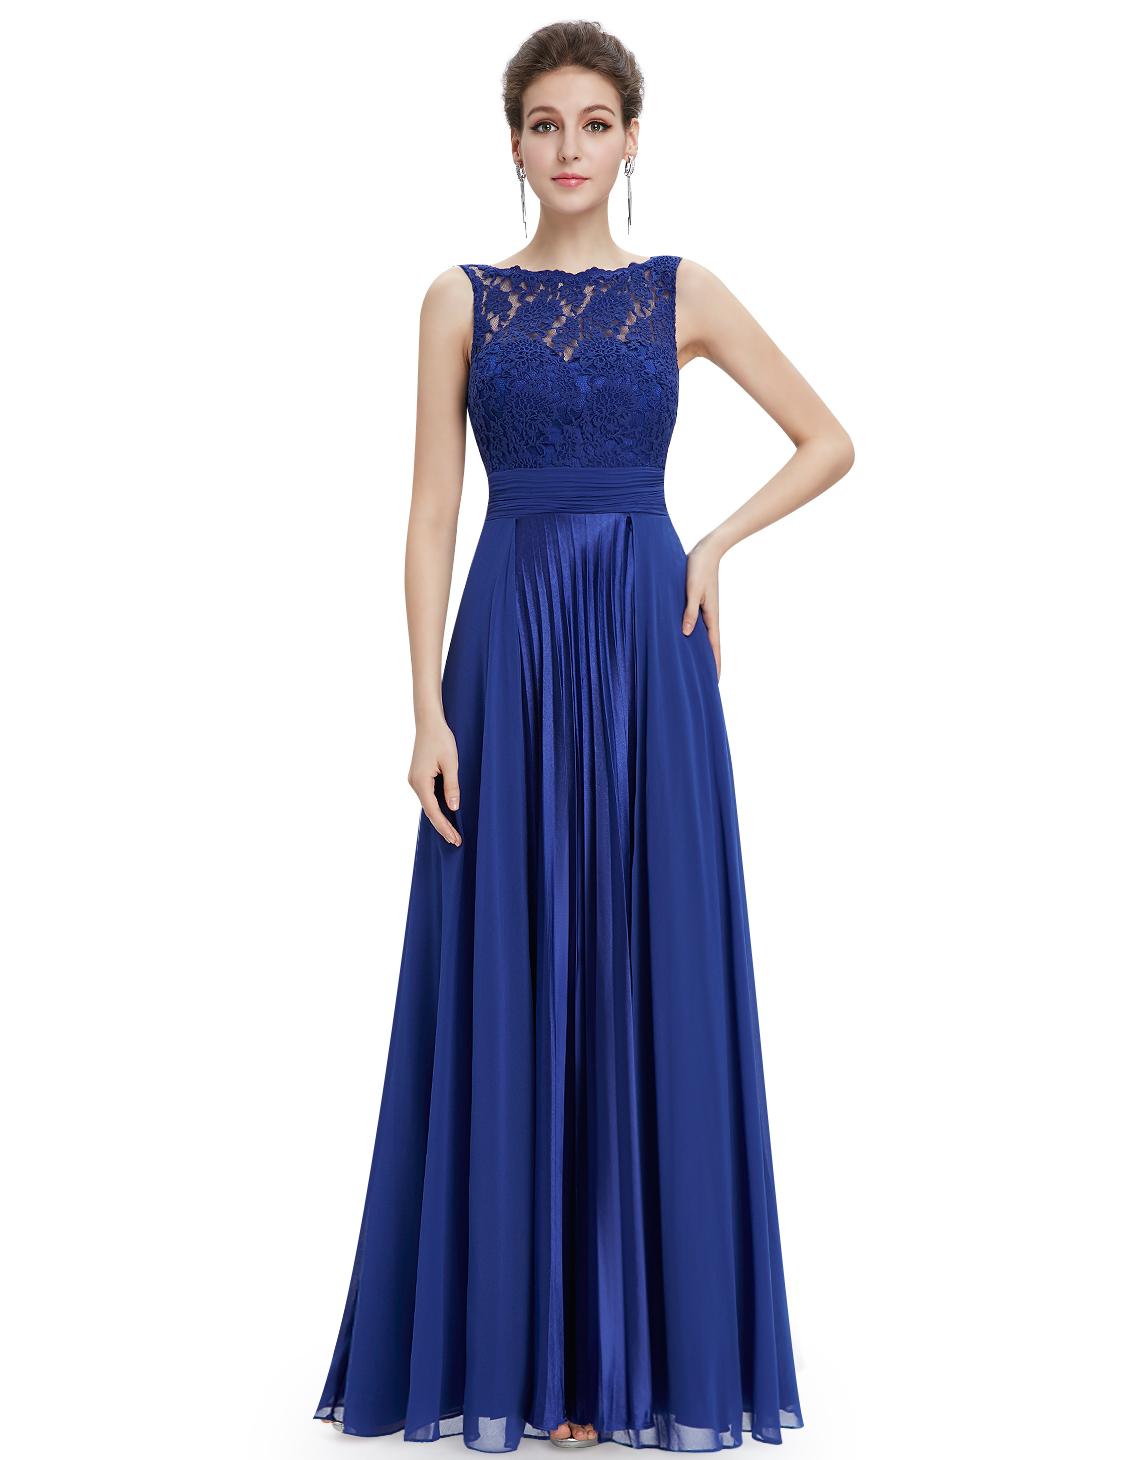 51f8e1d002 √ Lace Formal Dresses